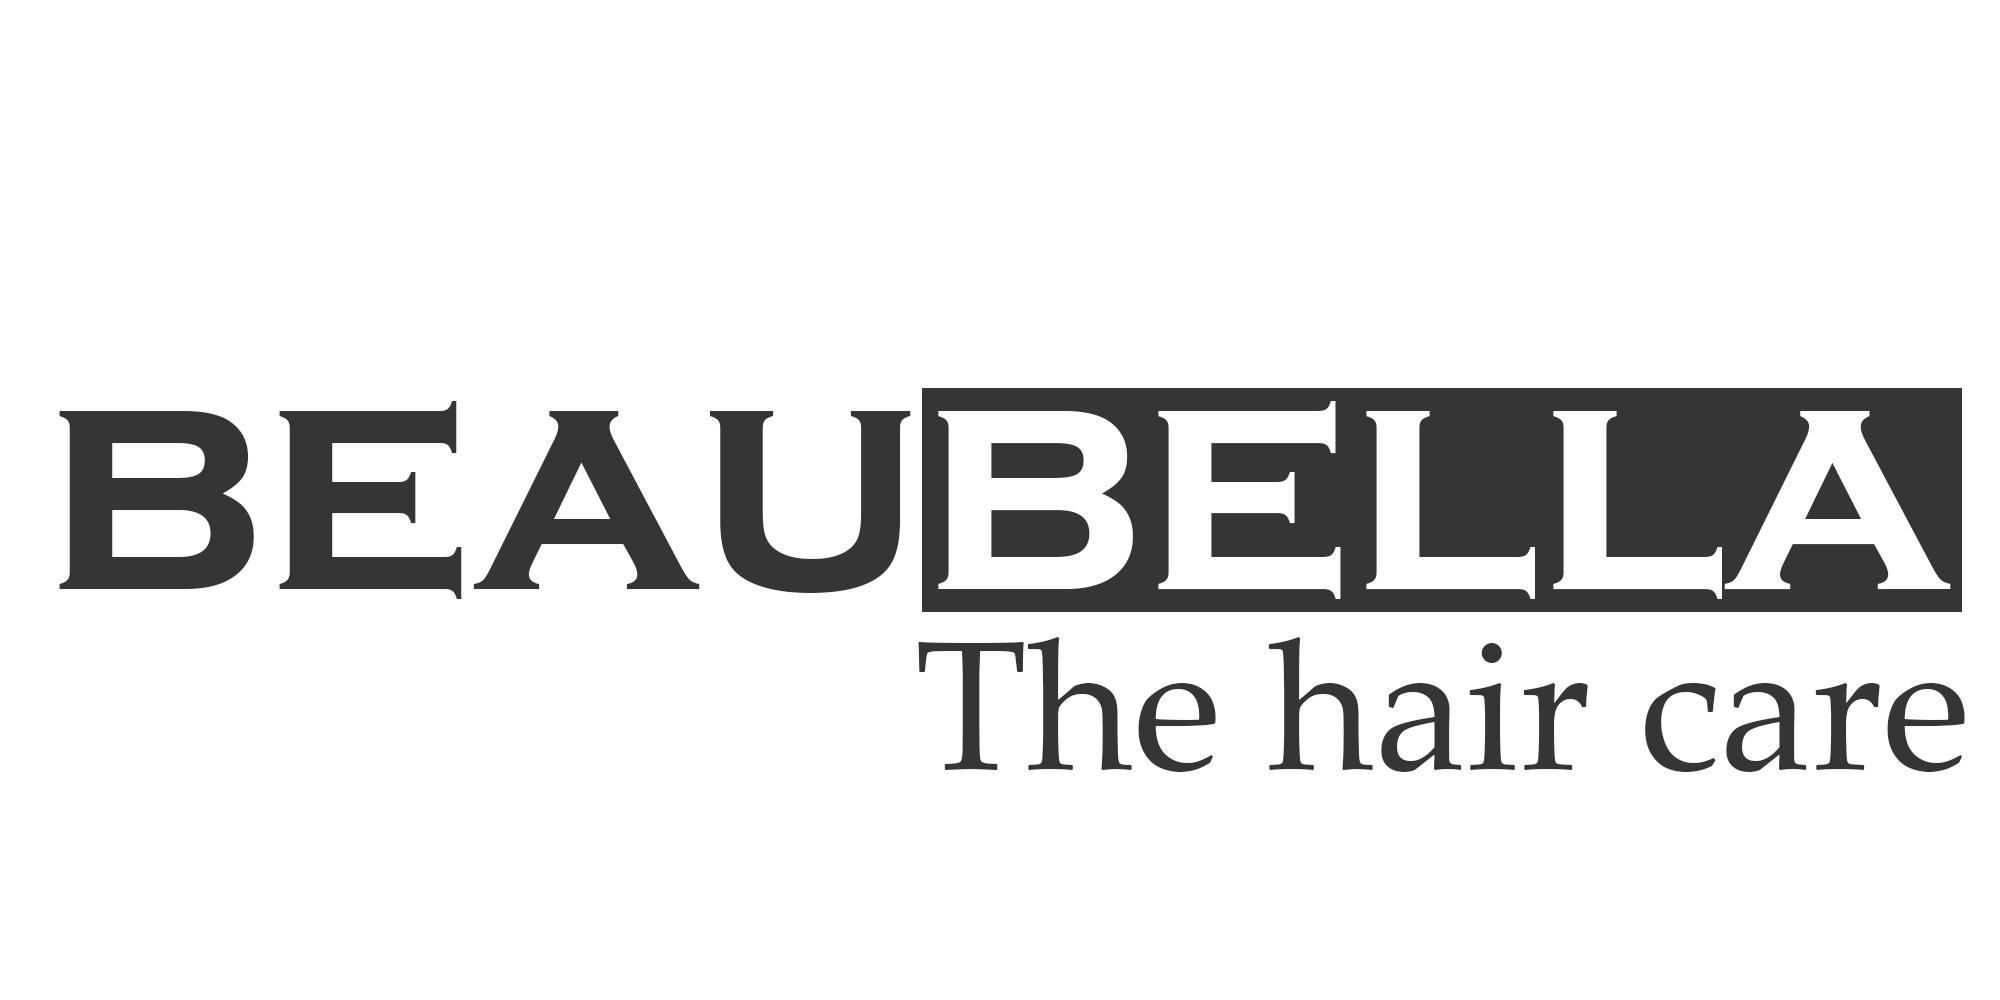 beaubella